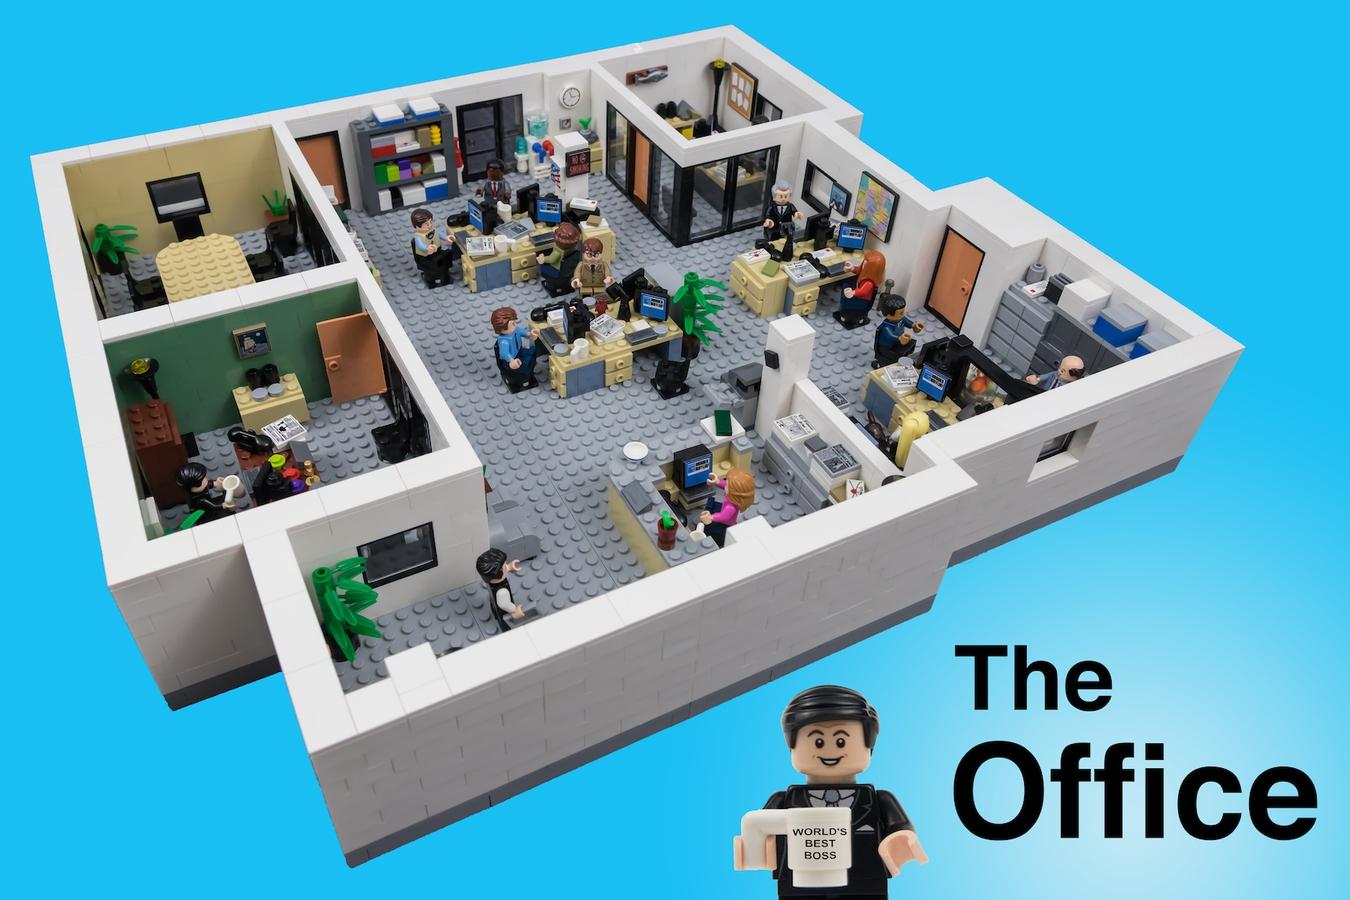 Delightful The Office   NBC